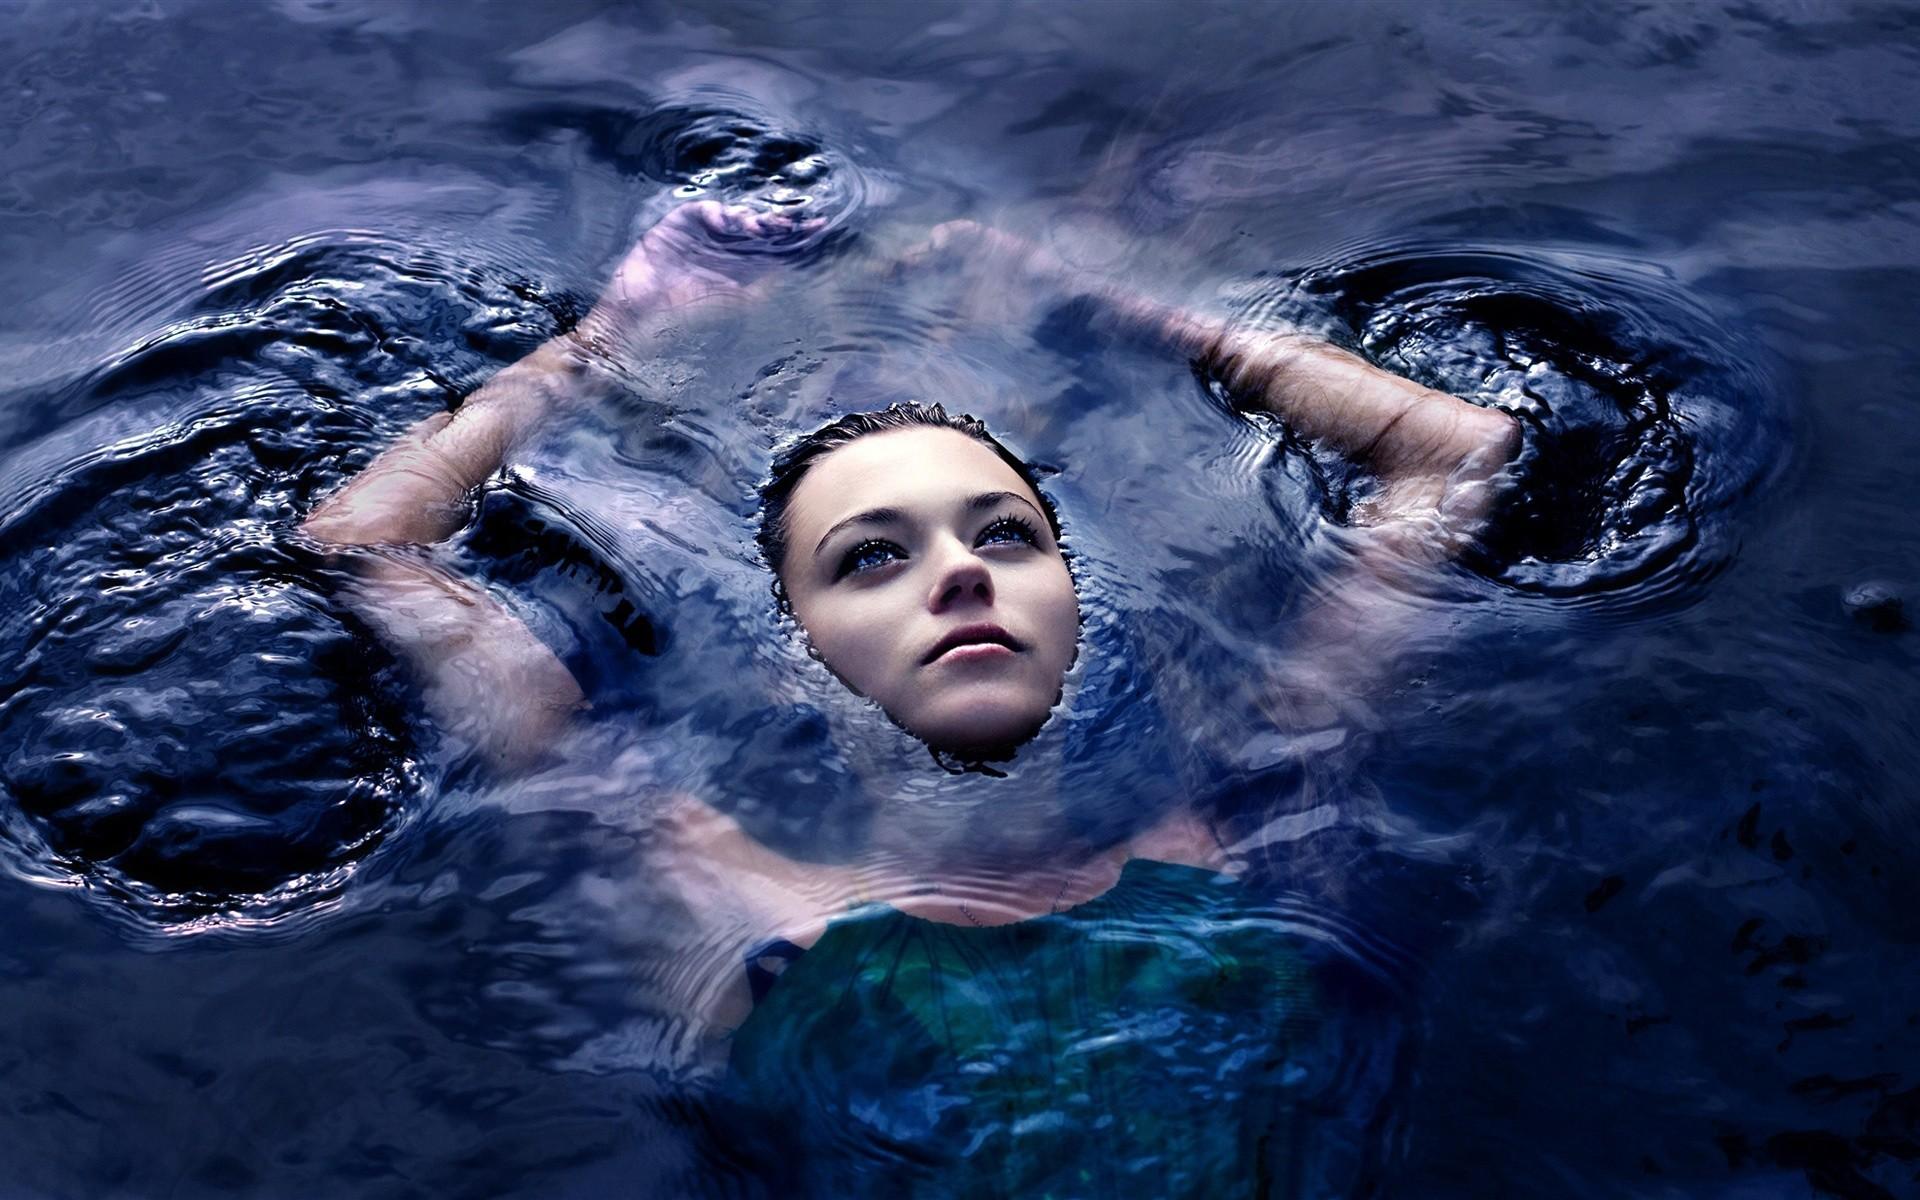 Girl in the water wallpaper 1920×1200